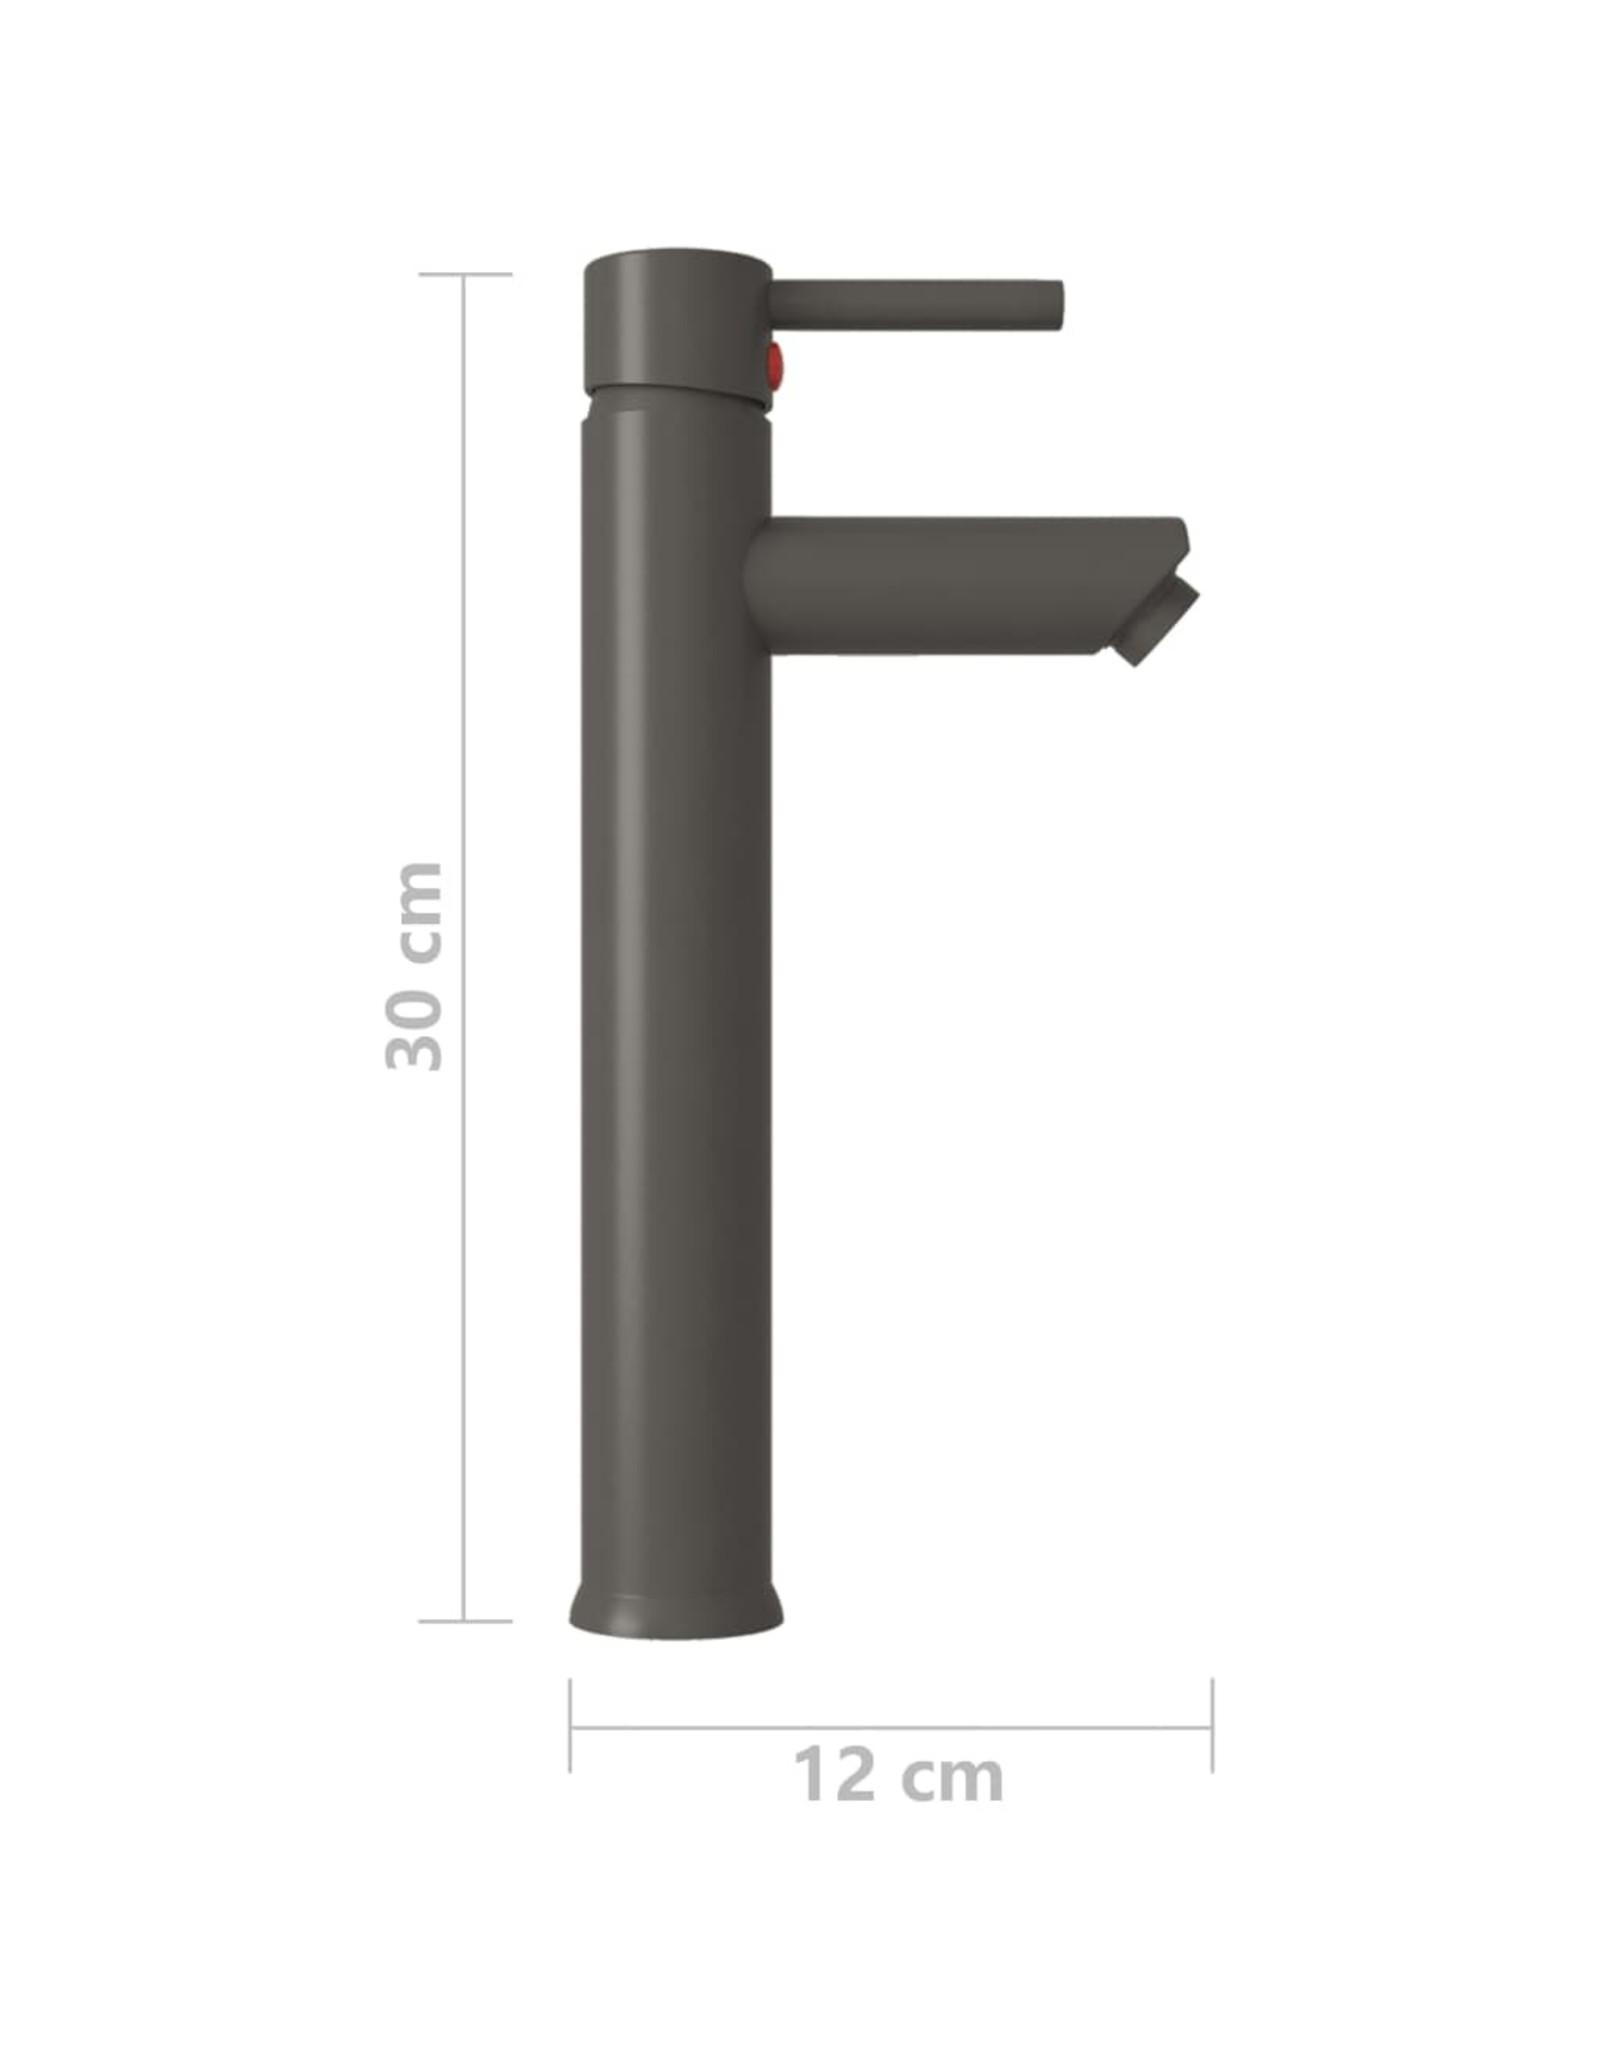 Badkamermengkraan 12x30 cm grijs